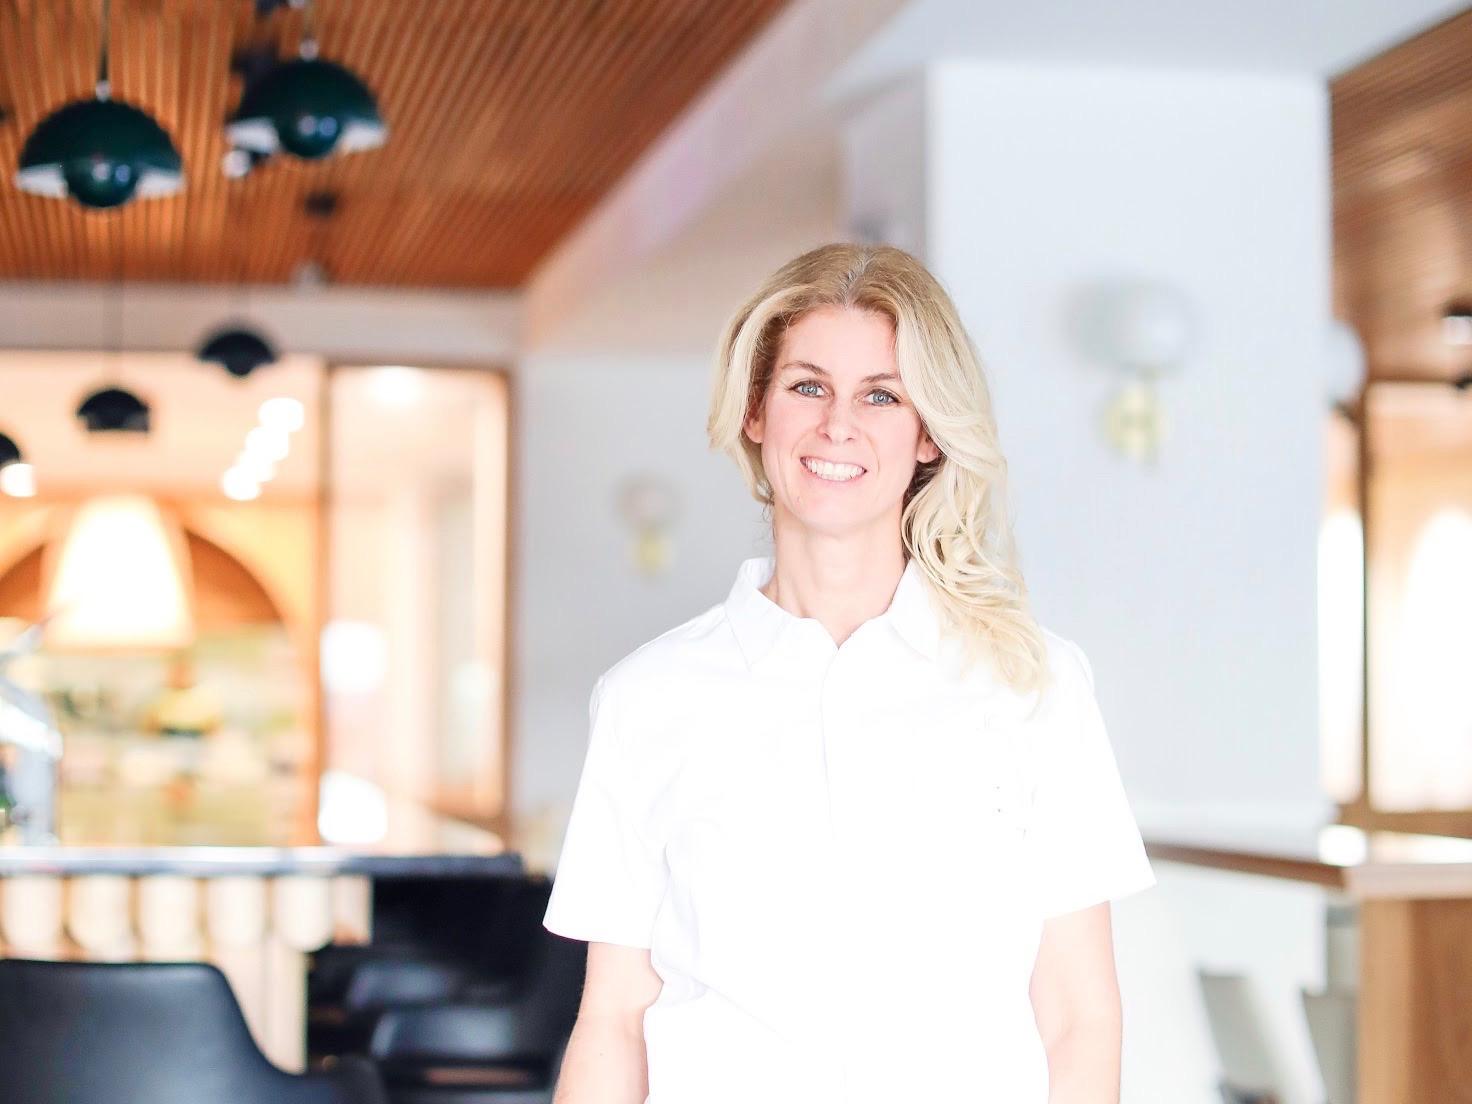 women in white shirt standing in restaurants